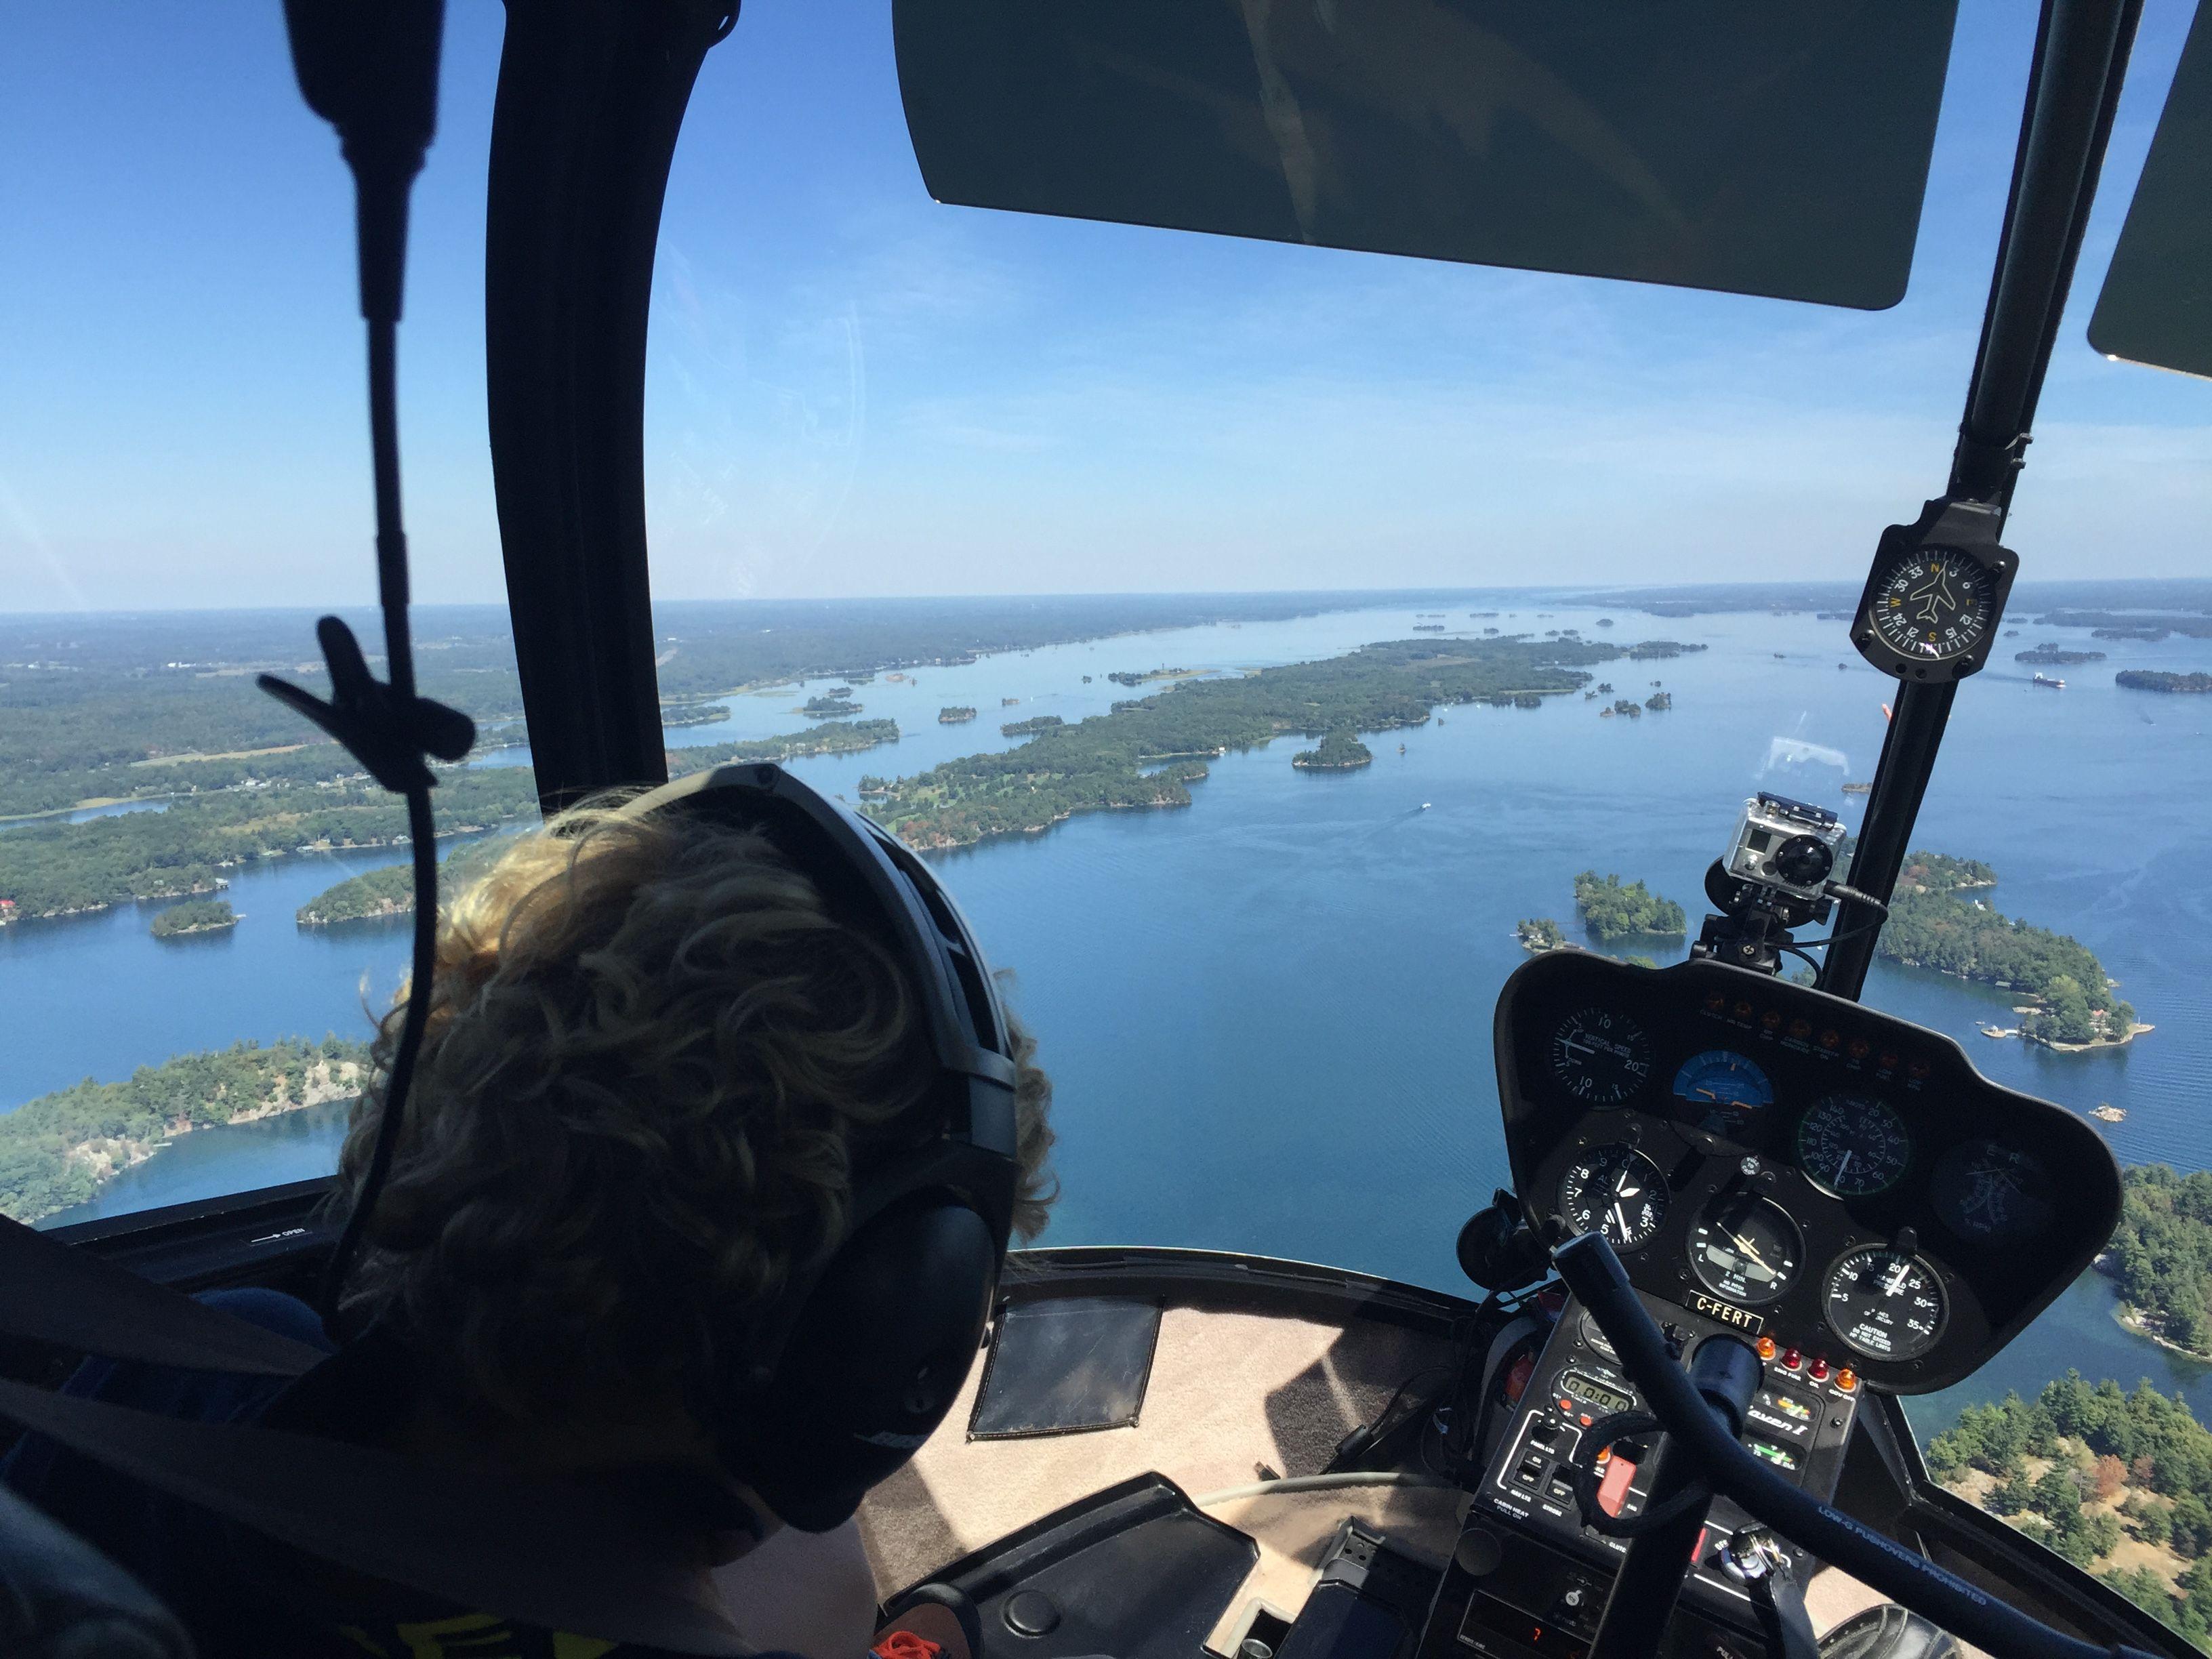 sobrevolar helicoptero mil islas